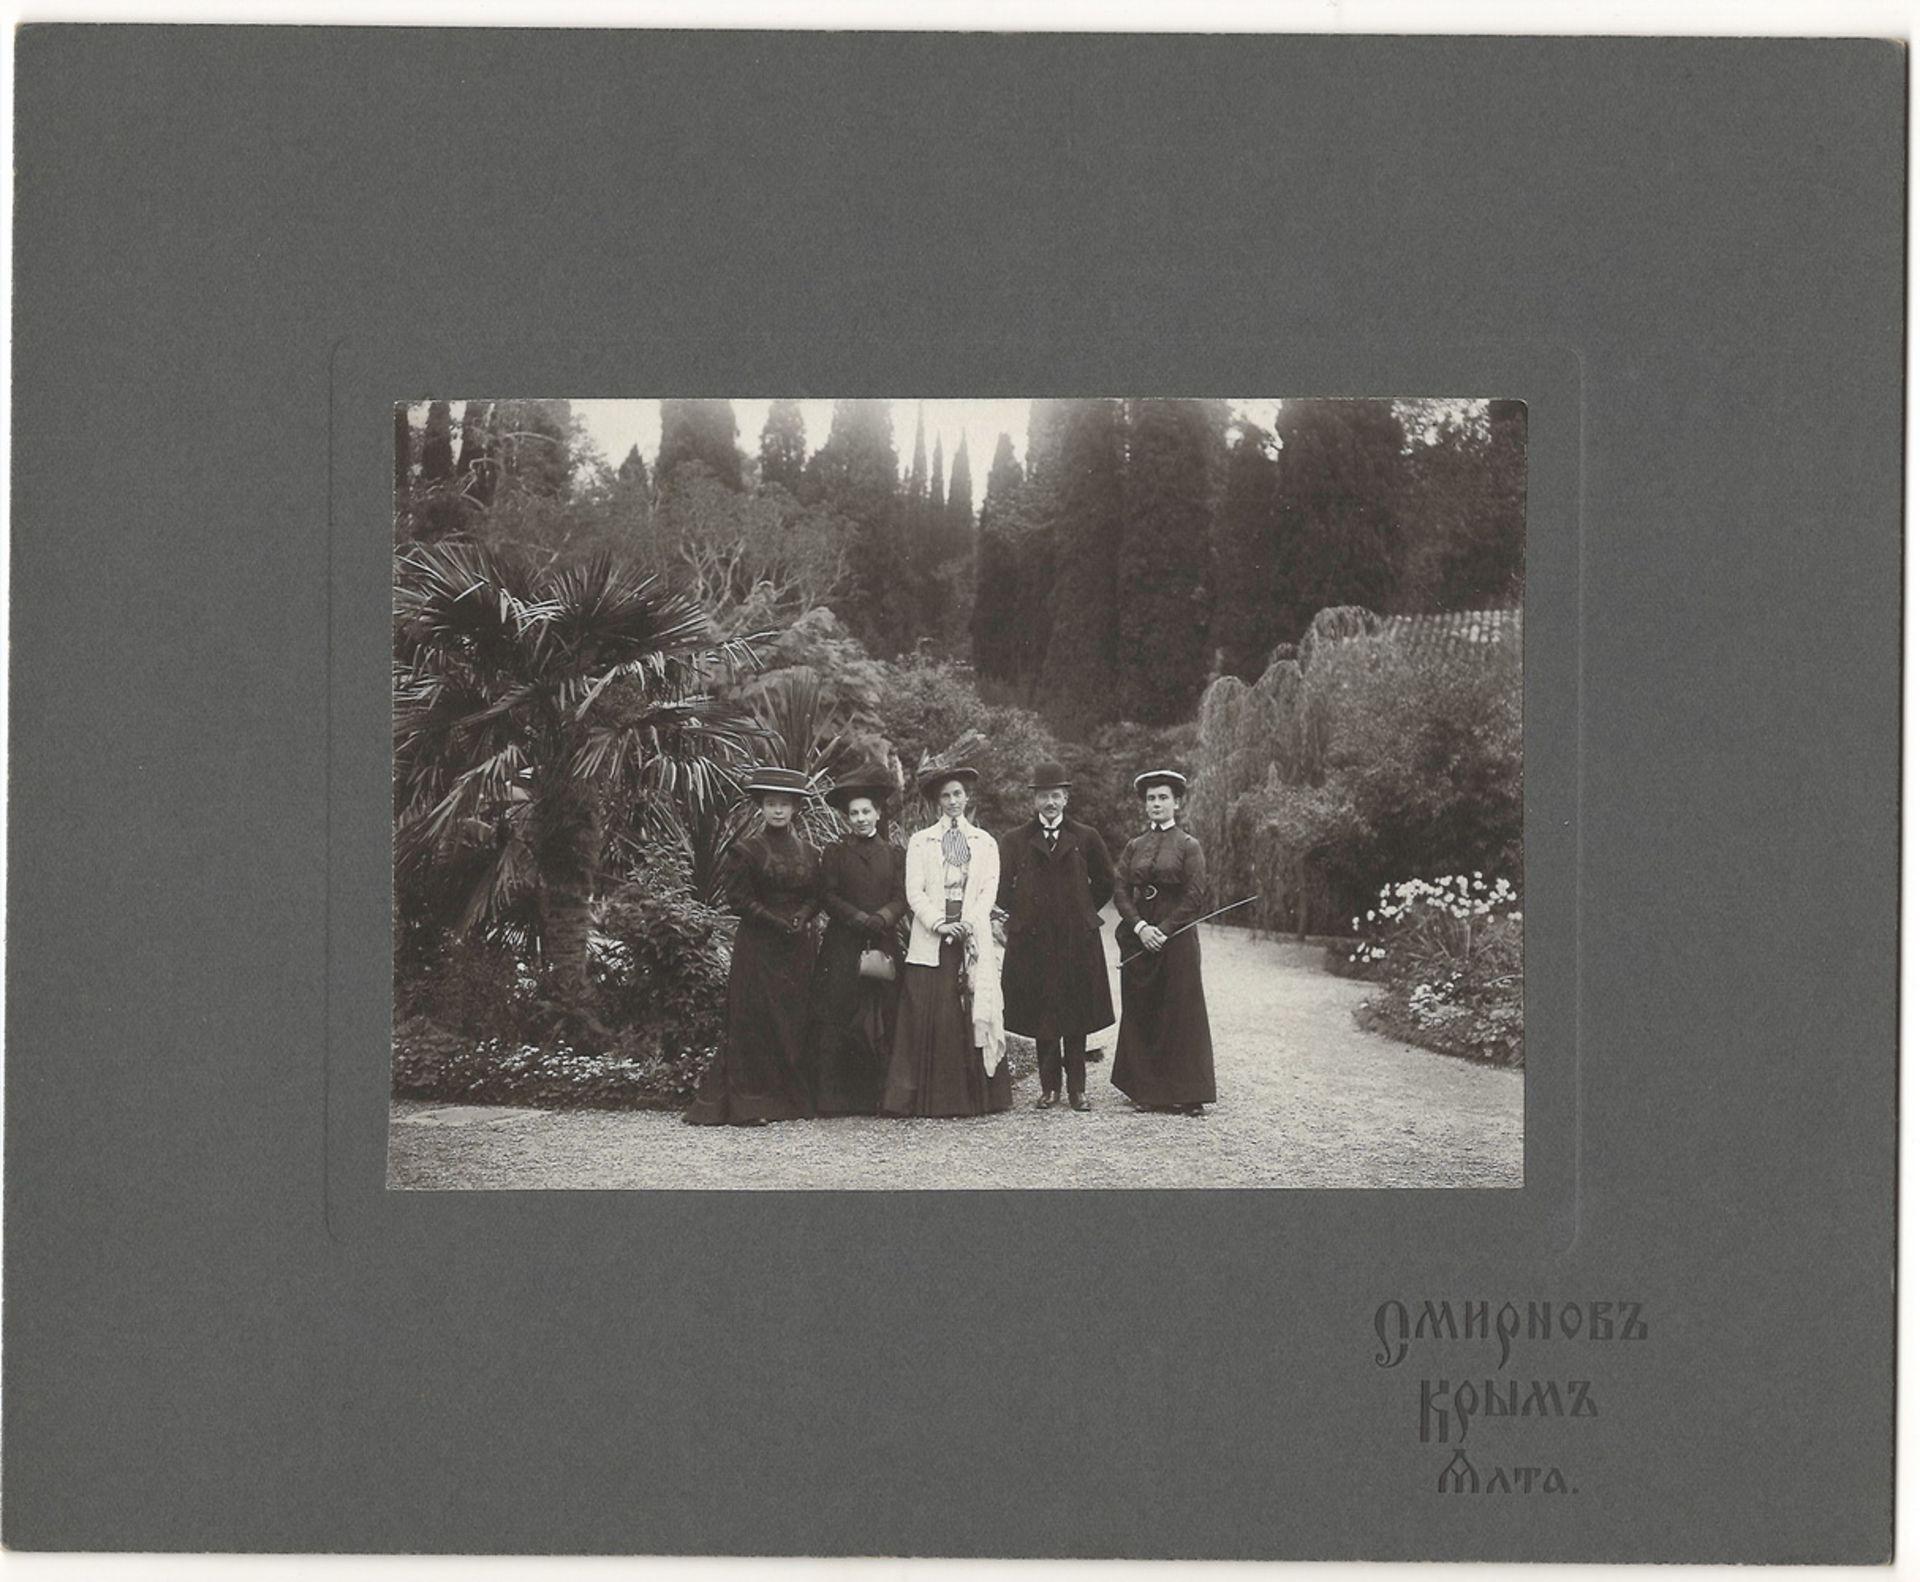 [Russian Empire]. Smirnov, I. Group portrait. Photograph. Author's print. Yalta, [late 19th century] - Bild 2 aus 2